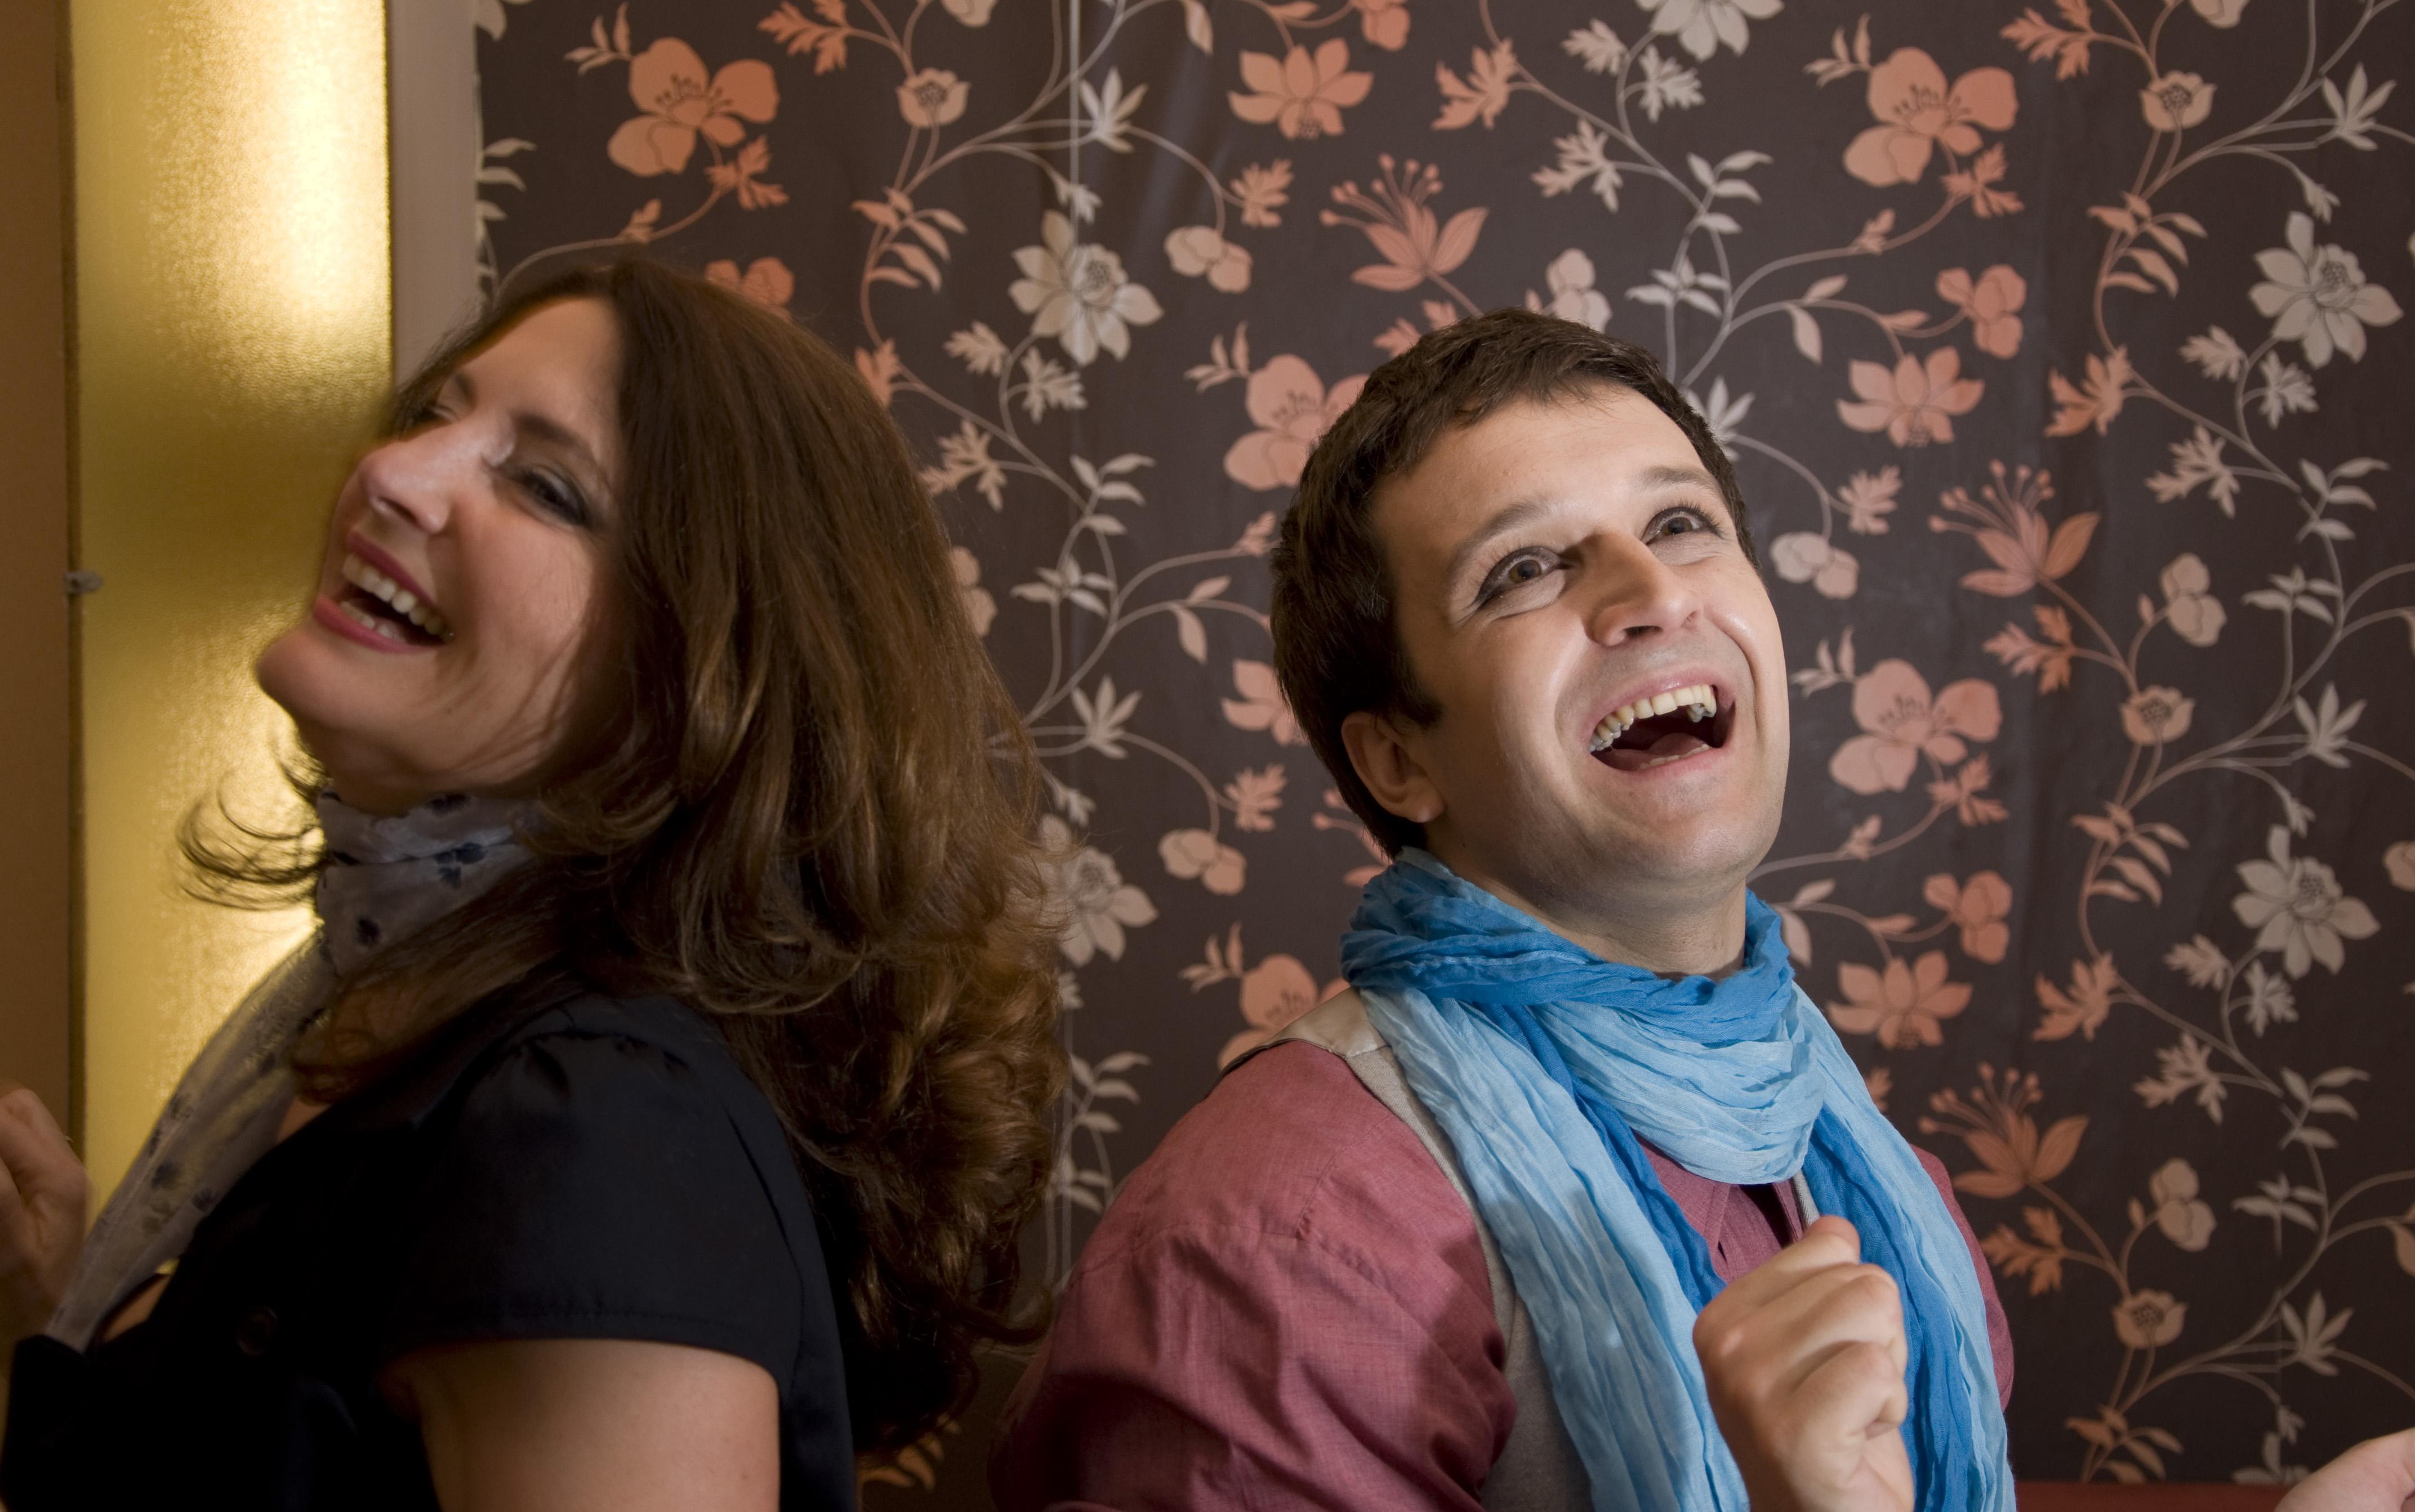 Branka Pujic and Nemanja Oliveric in Ljubav i moda: Eurostikla (2009)